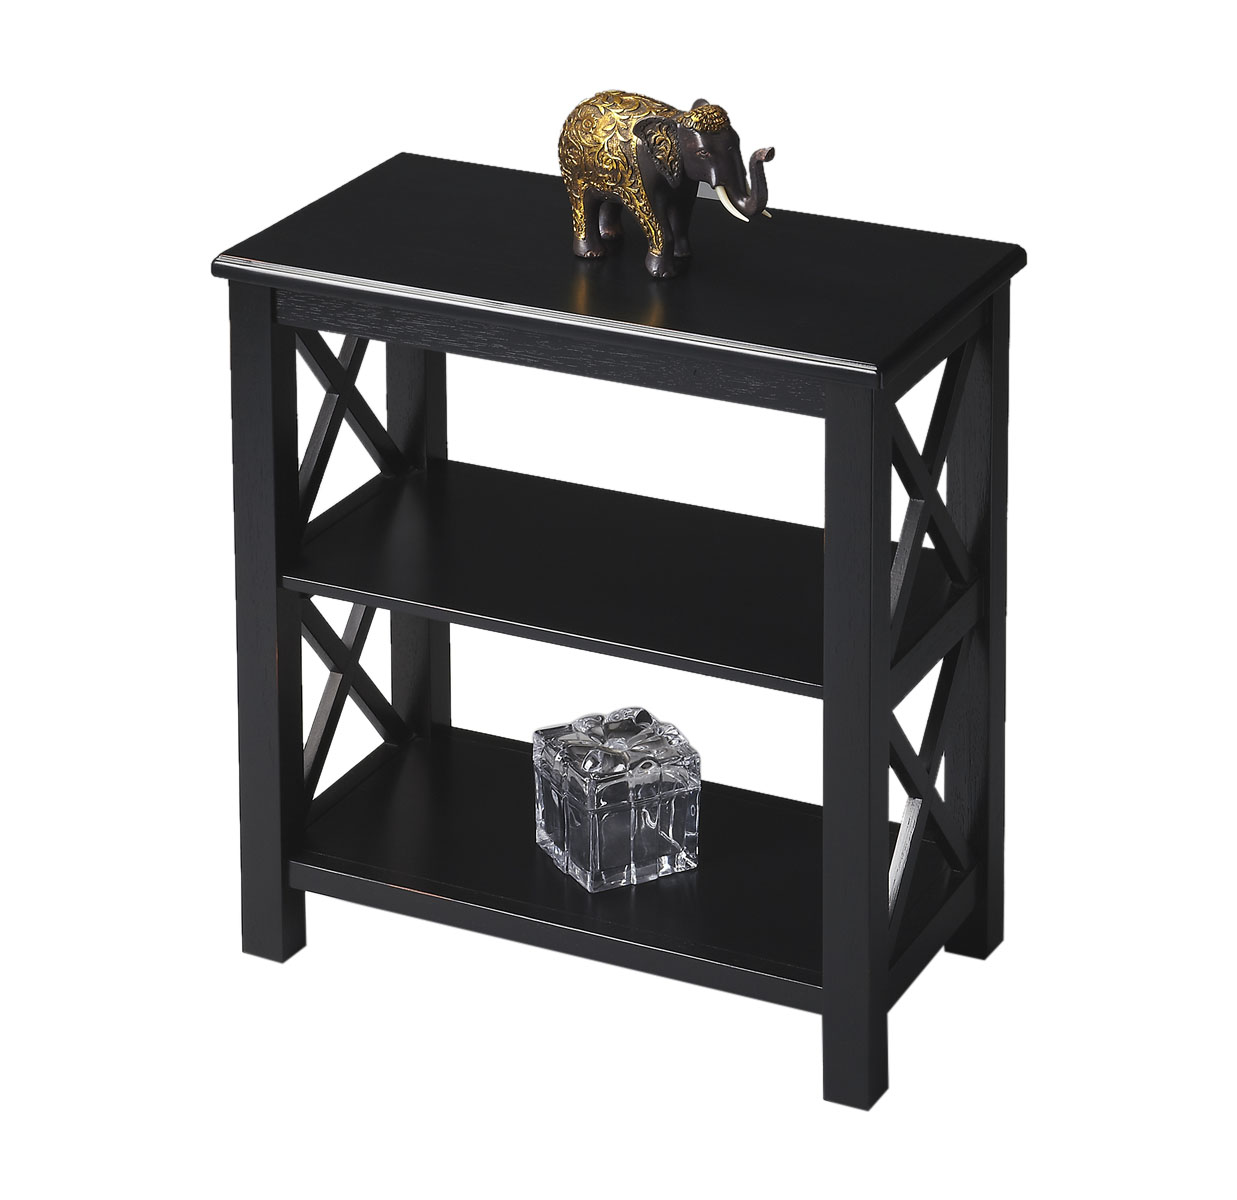 Offex Transitional Rectangular Bookcase - Black Licorice Finish